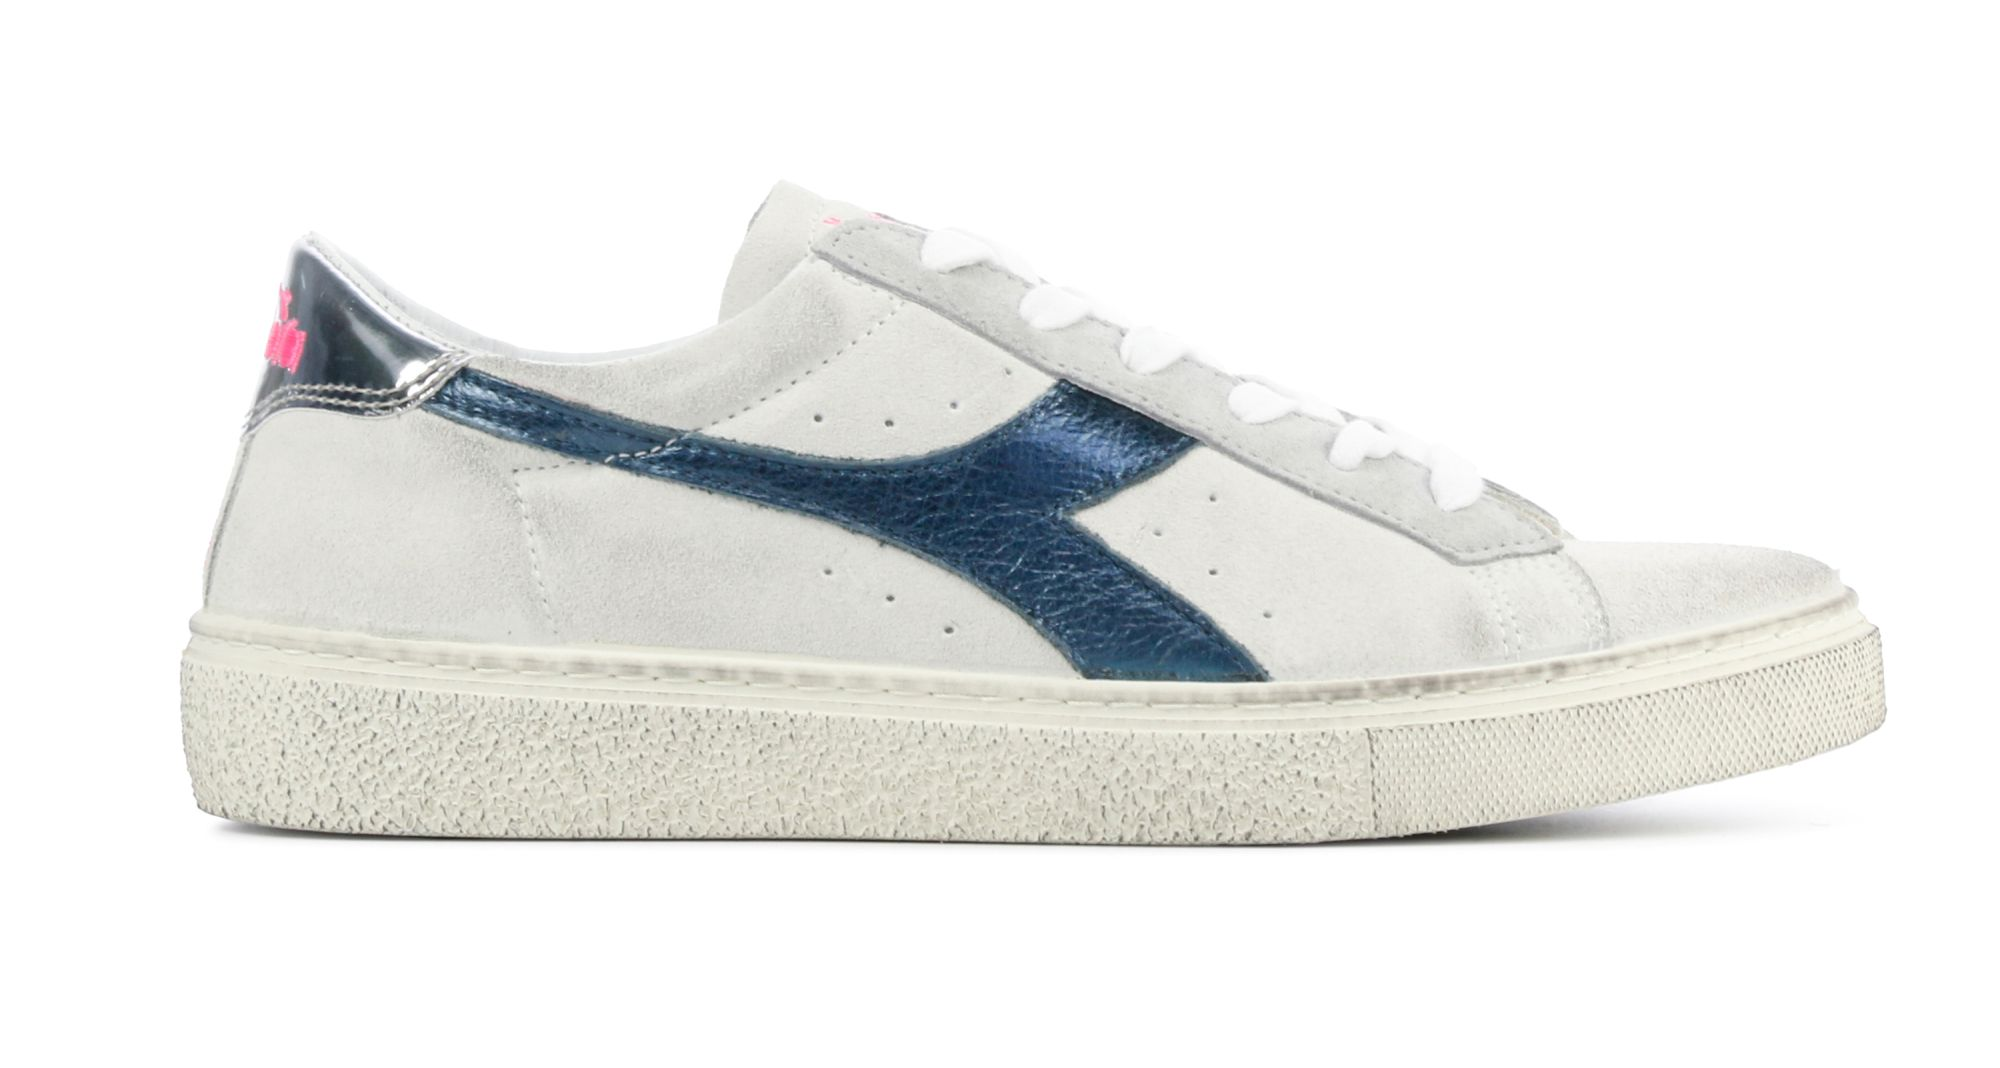 Diadora Heritage Dames Leren SneakersSneakers